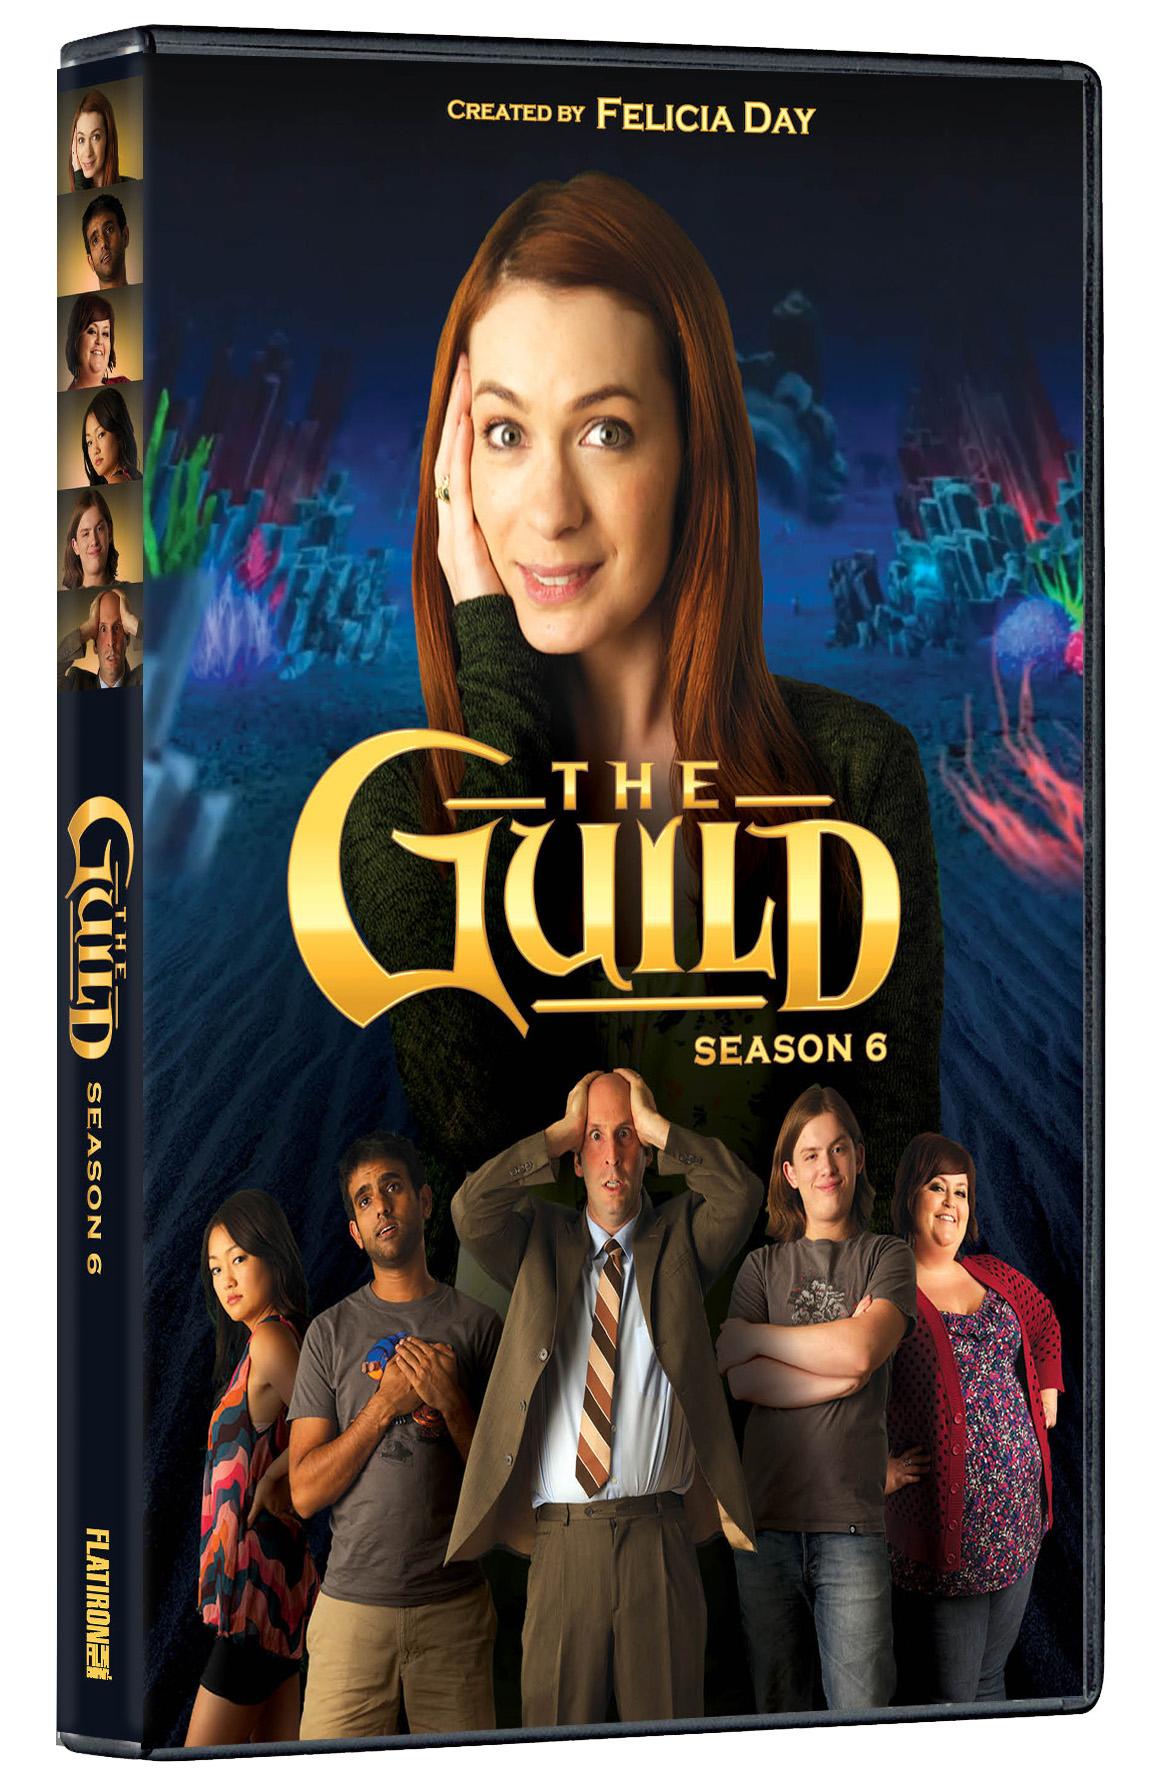 The Guild Season 6 DVD Review